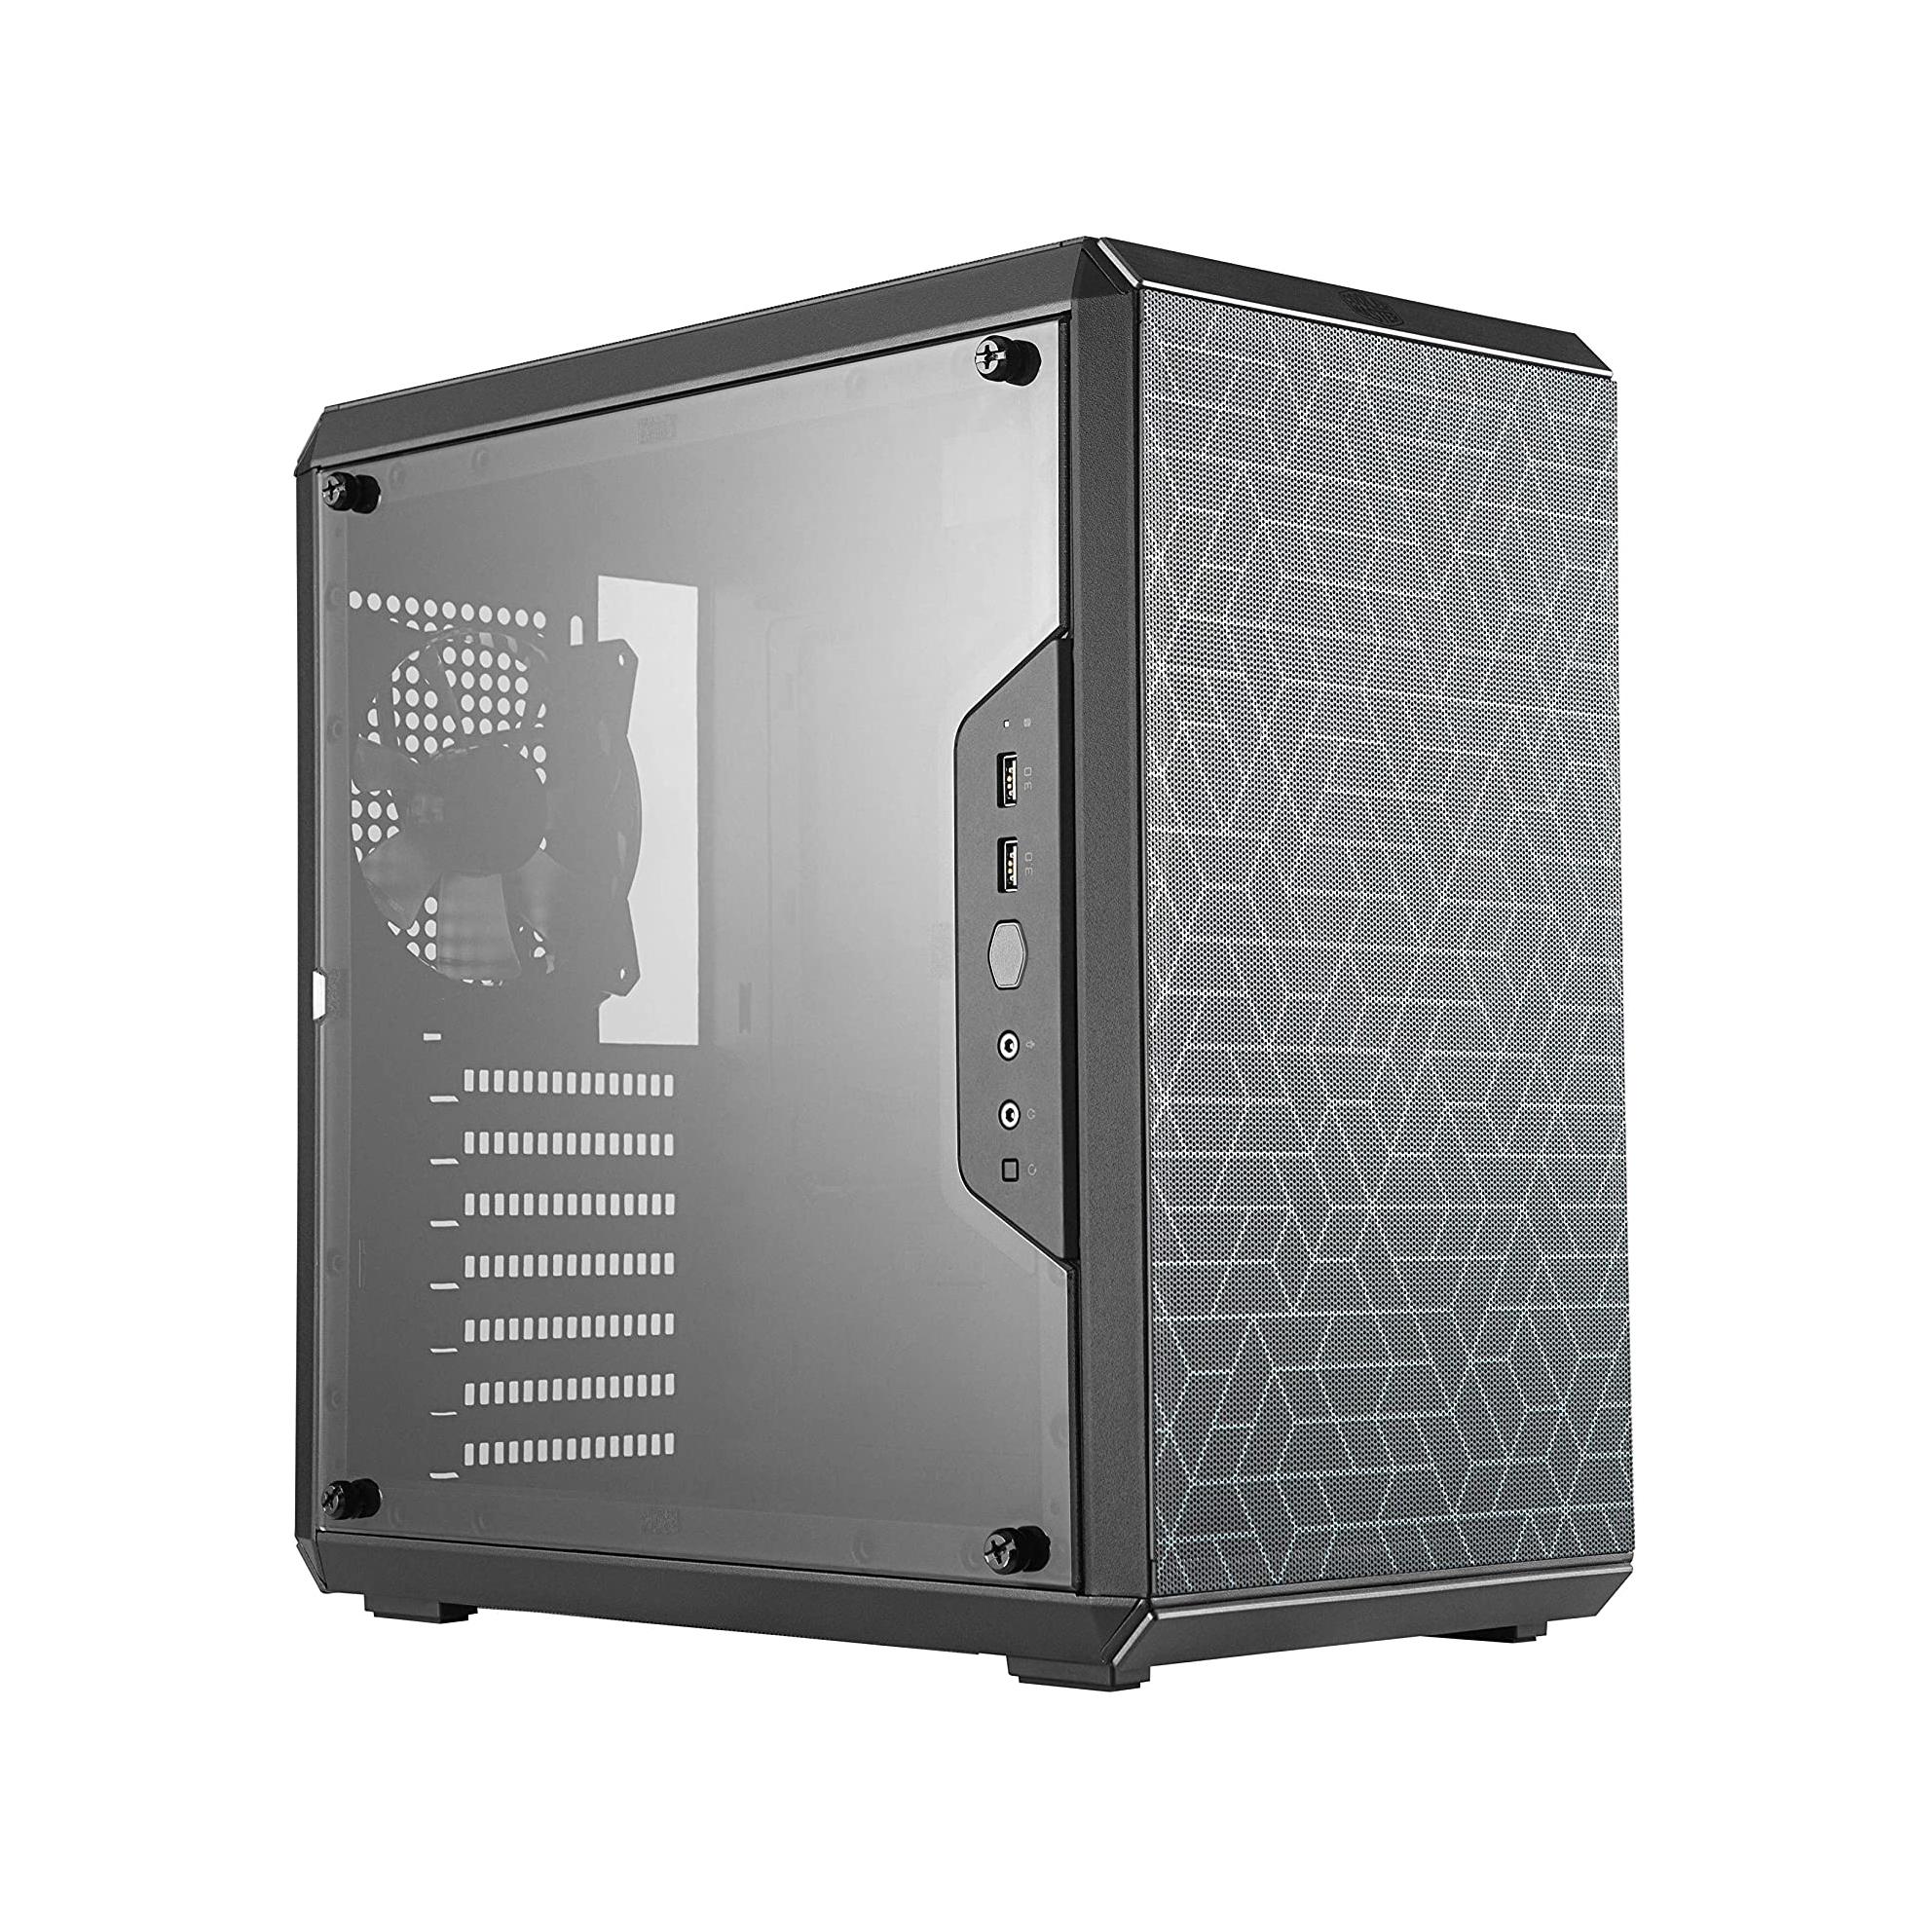 CASE COOLER MASTER GAMING MASTERBOX Q500L MCB-Q500L-KANN-S00 ,Case & Power Supply